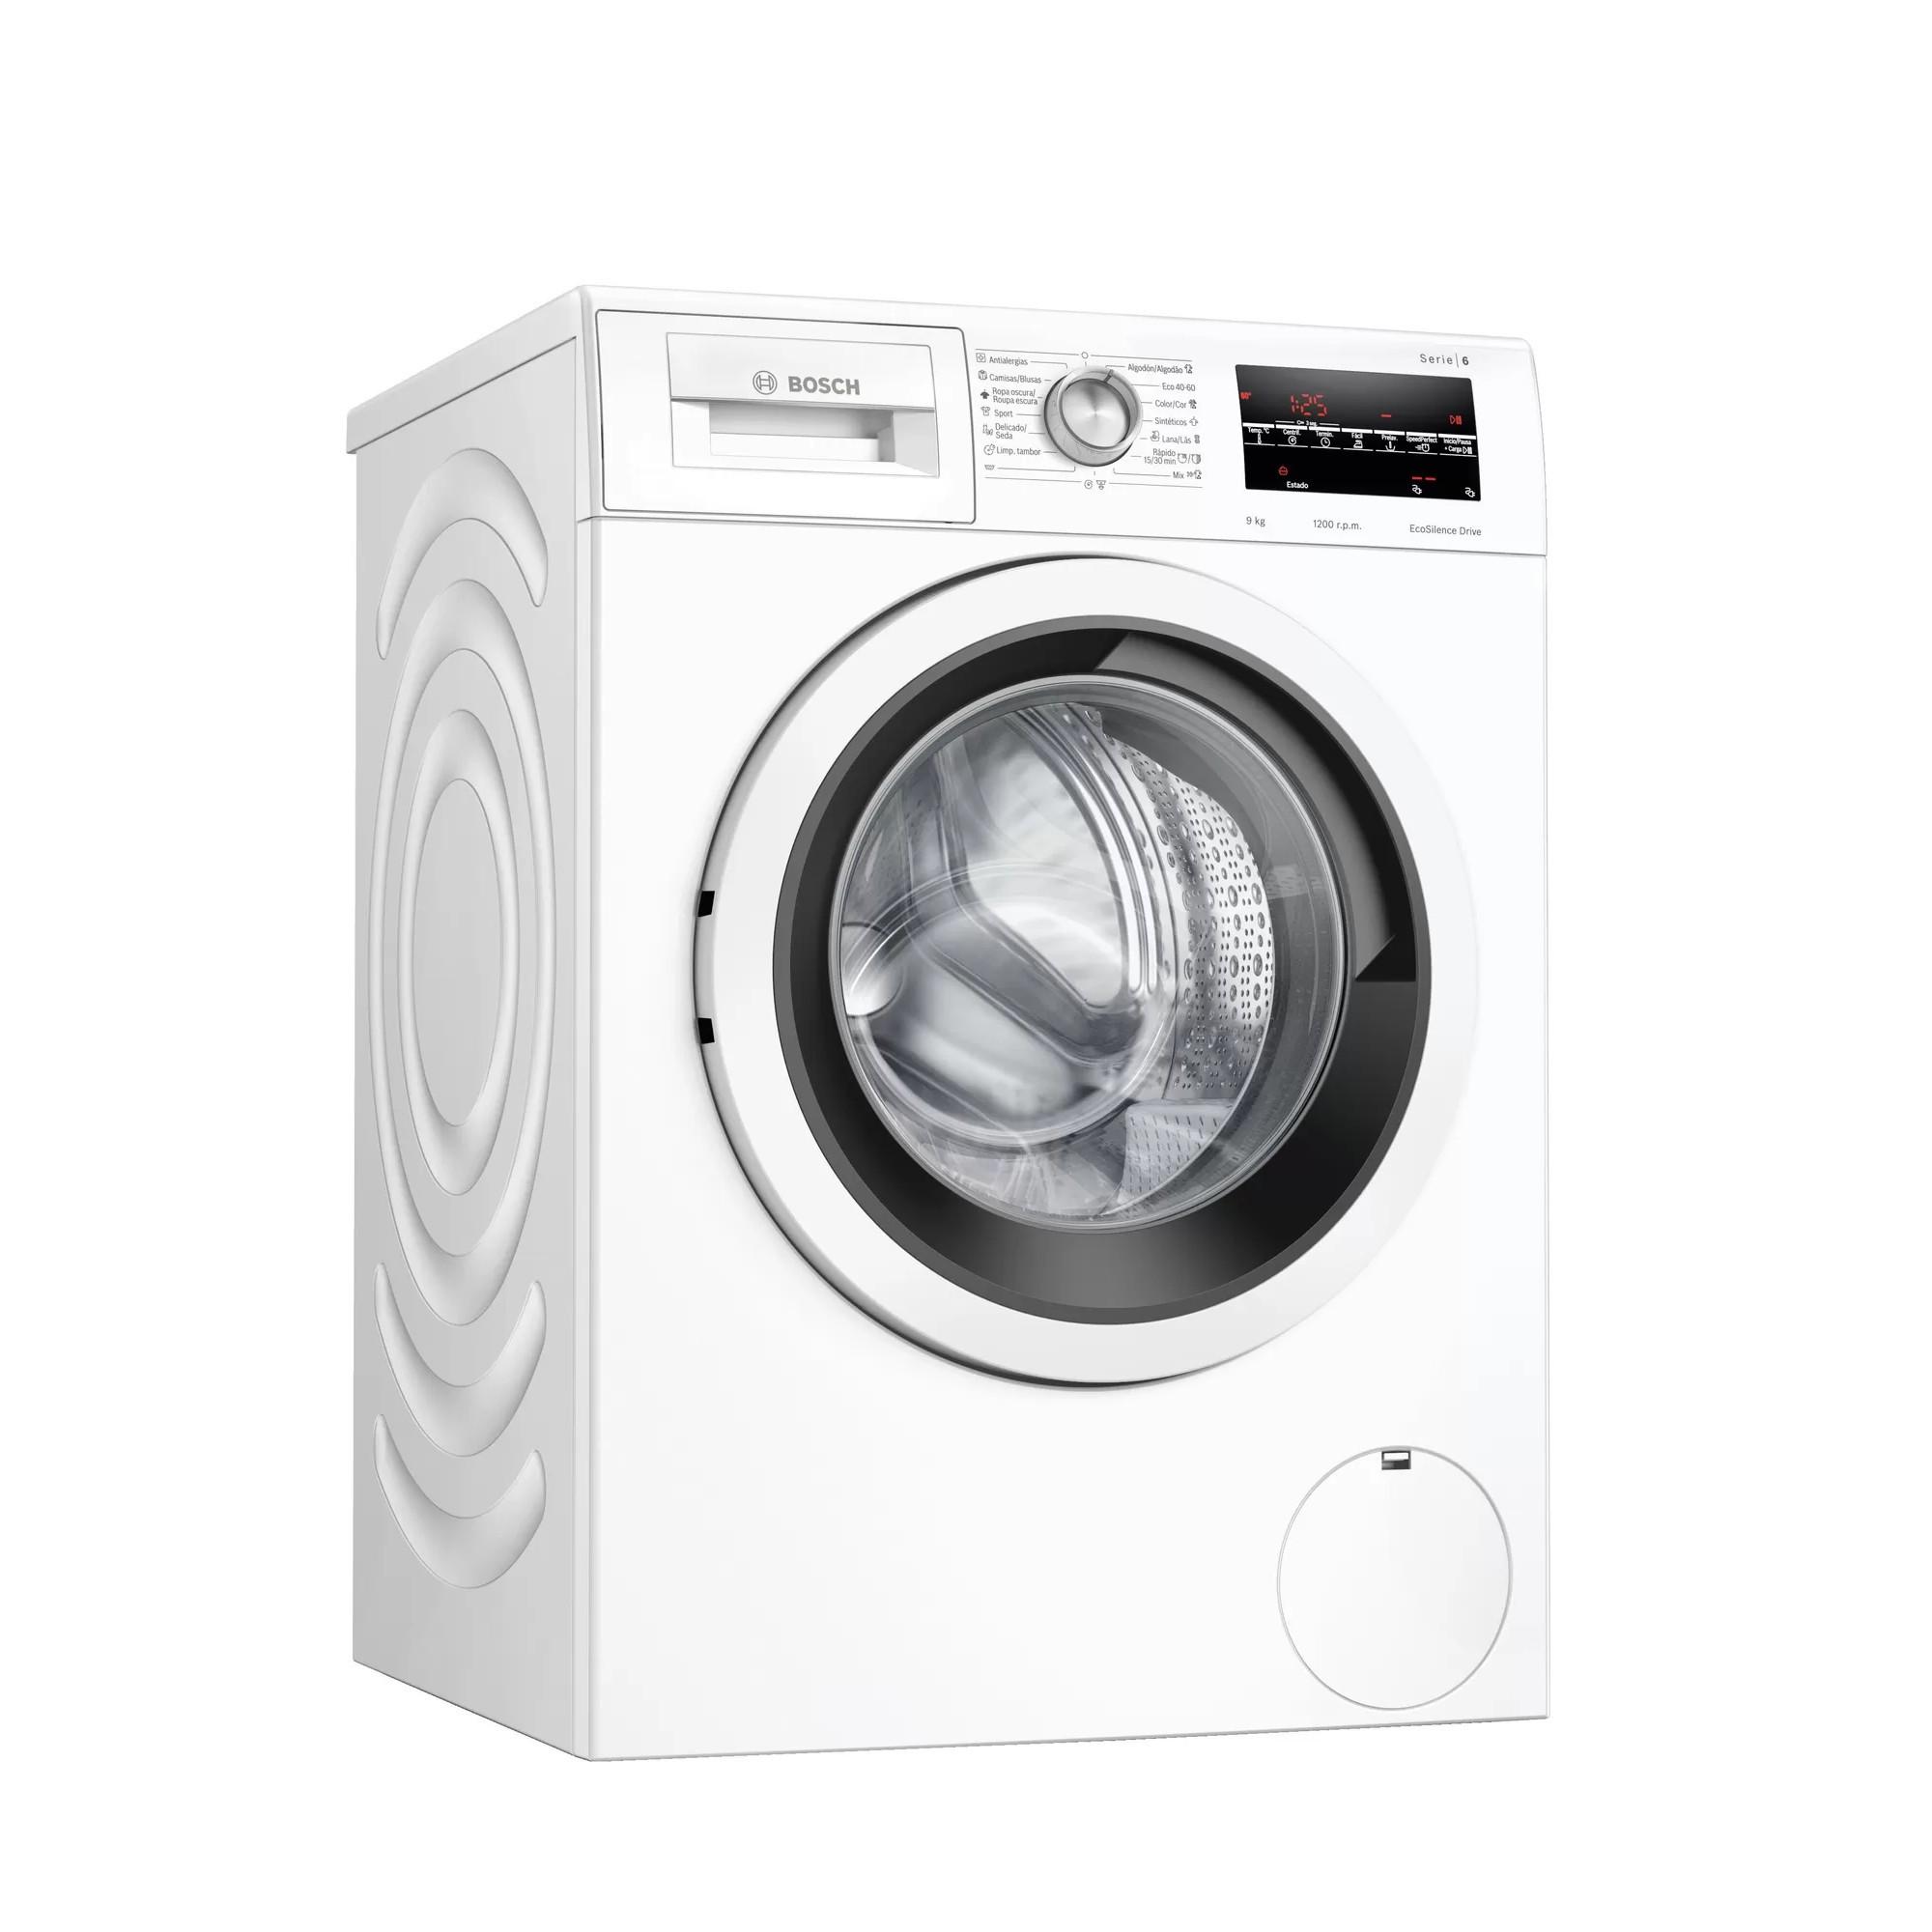 Lavadora Bosch Wau24t43es 9kg 1200rpm Blanca A+++(-30%)